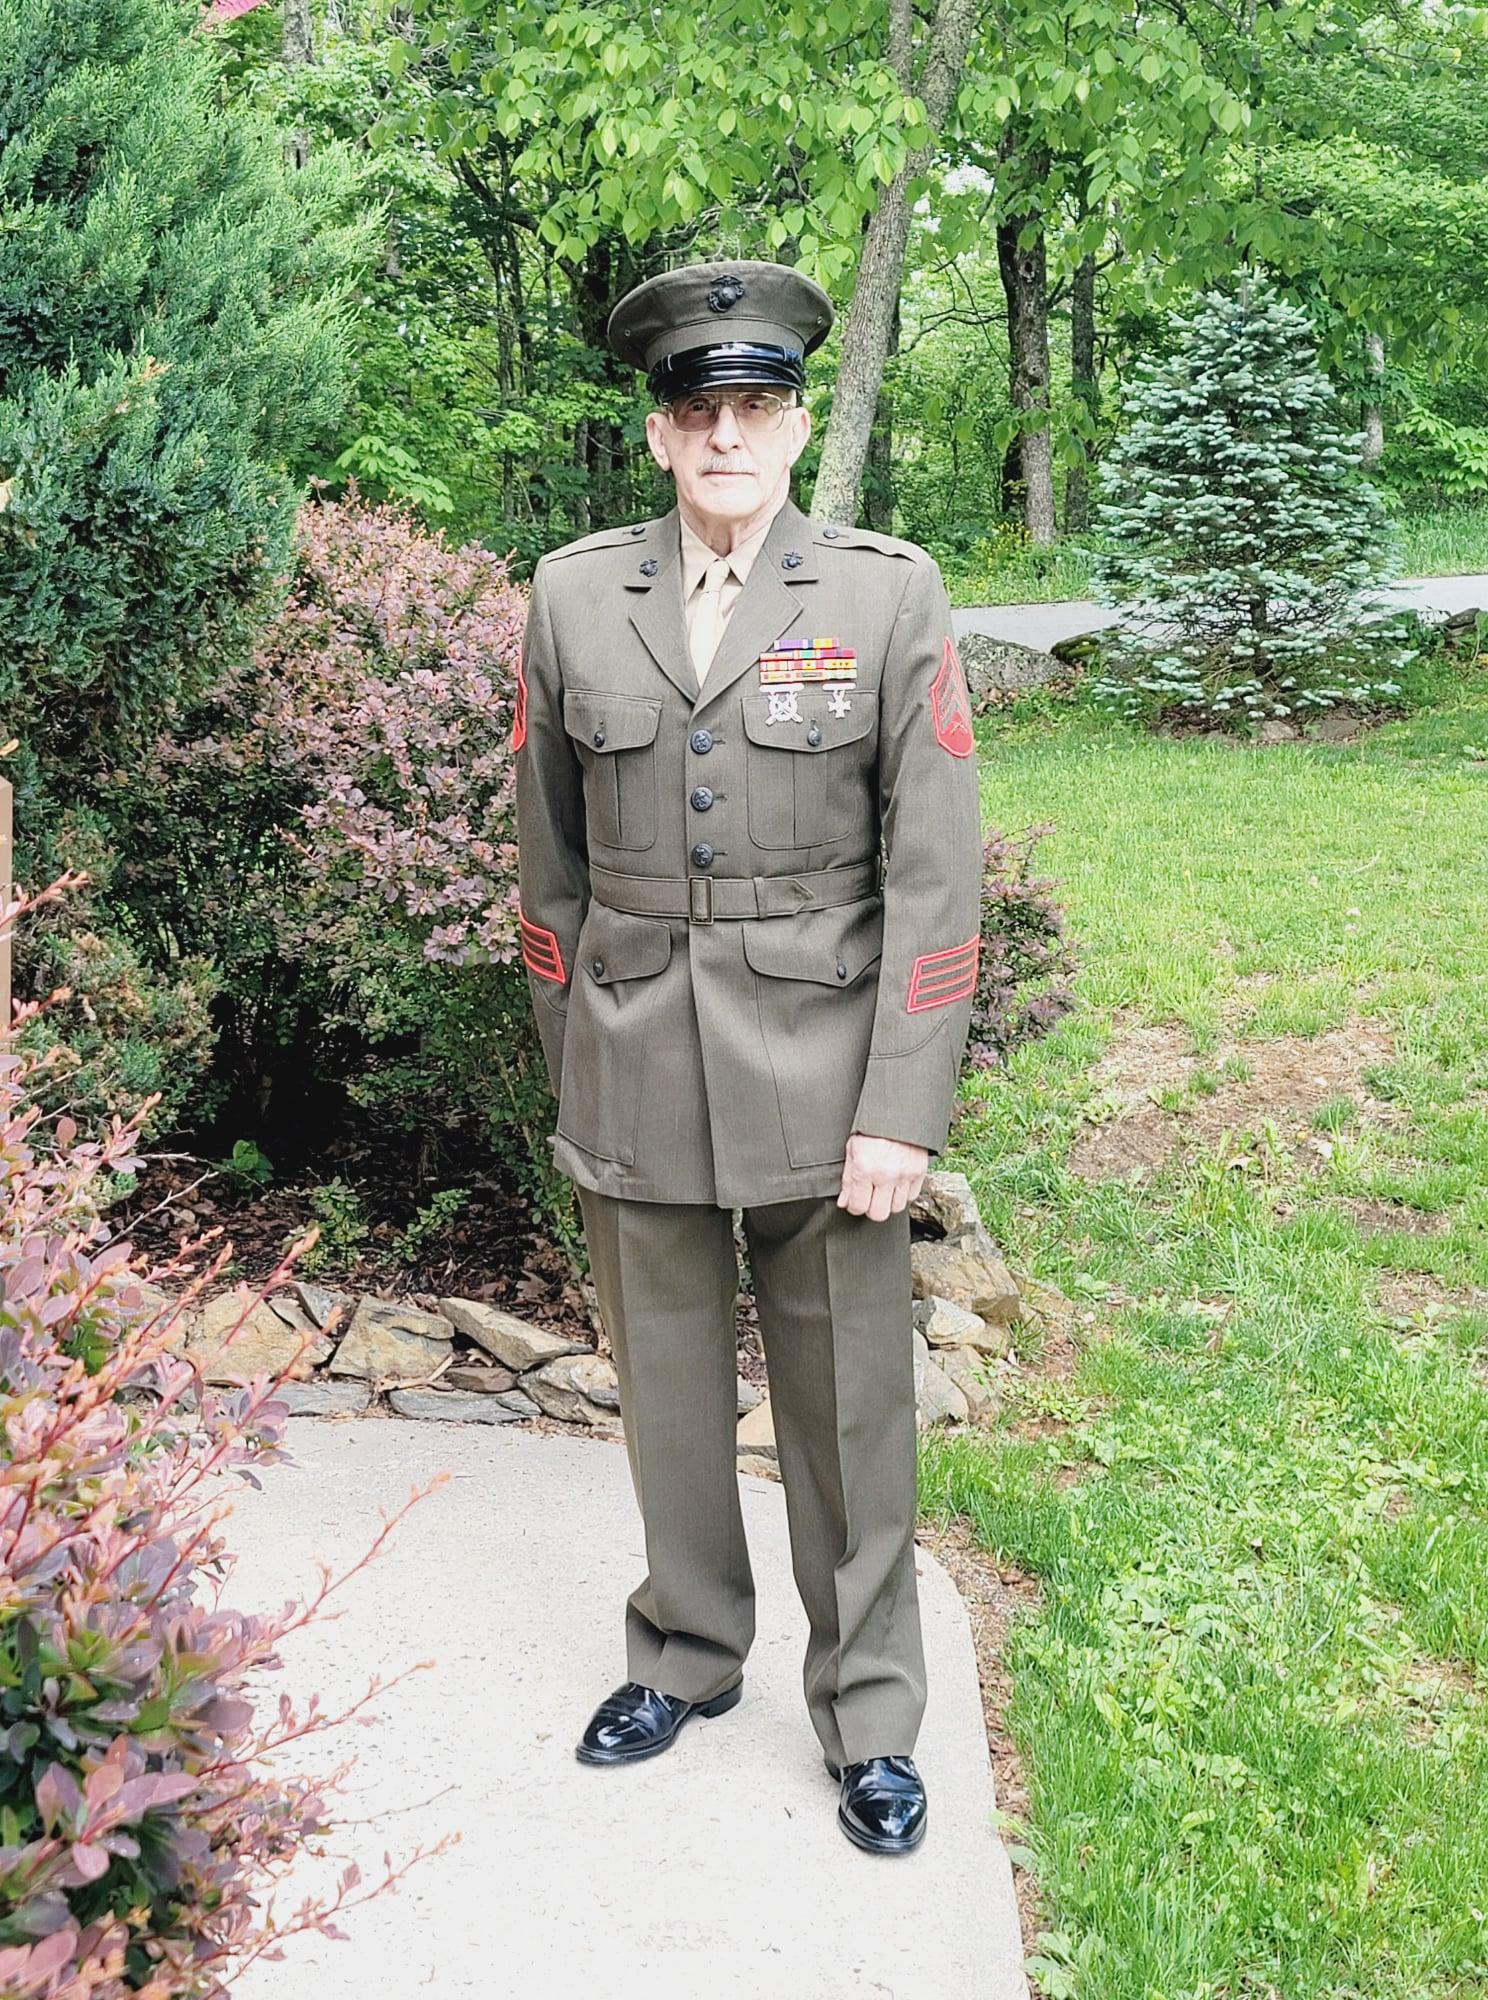 Older man in military uniform